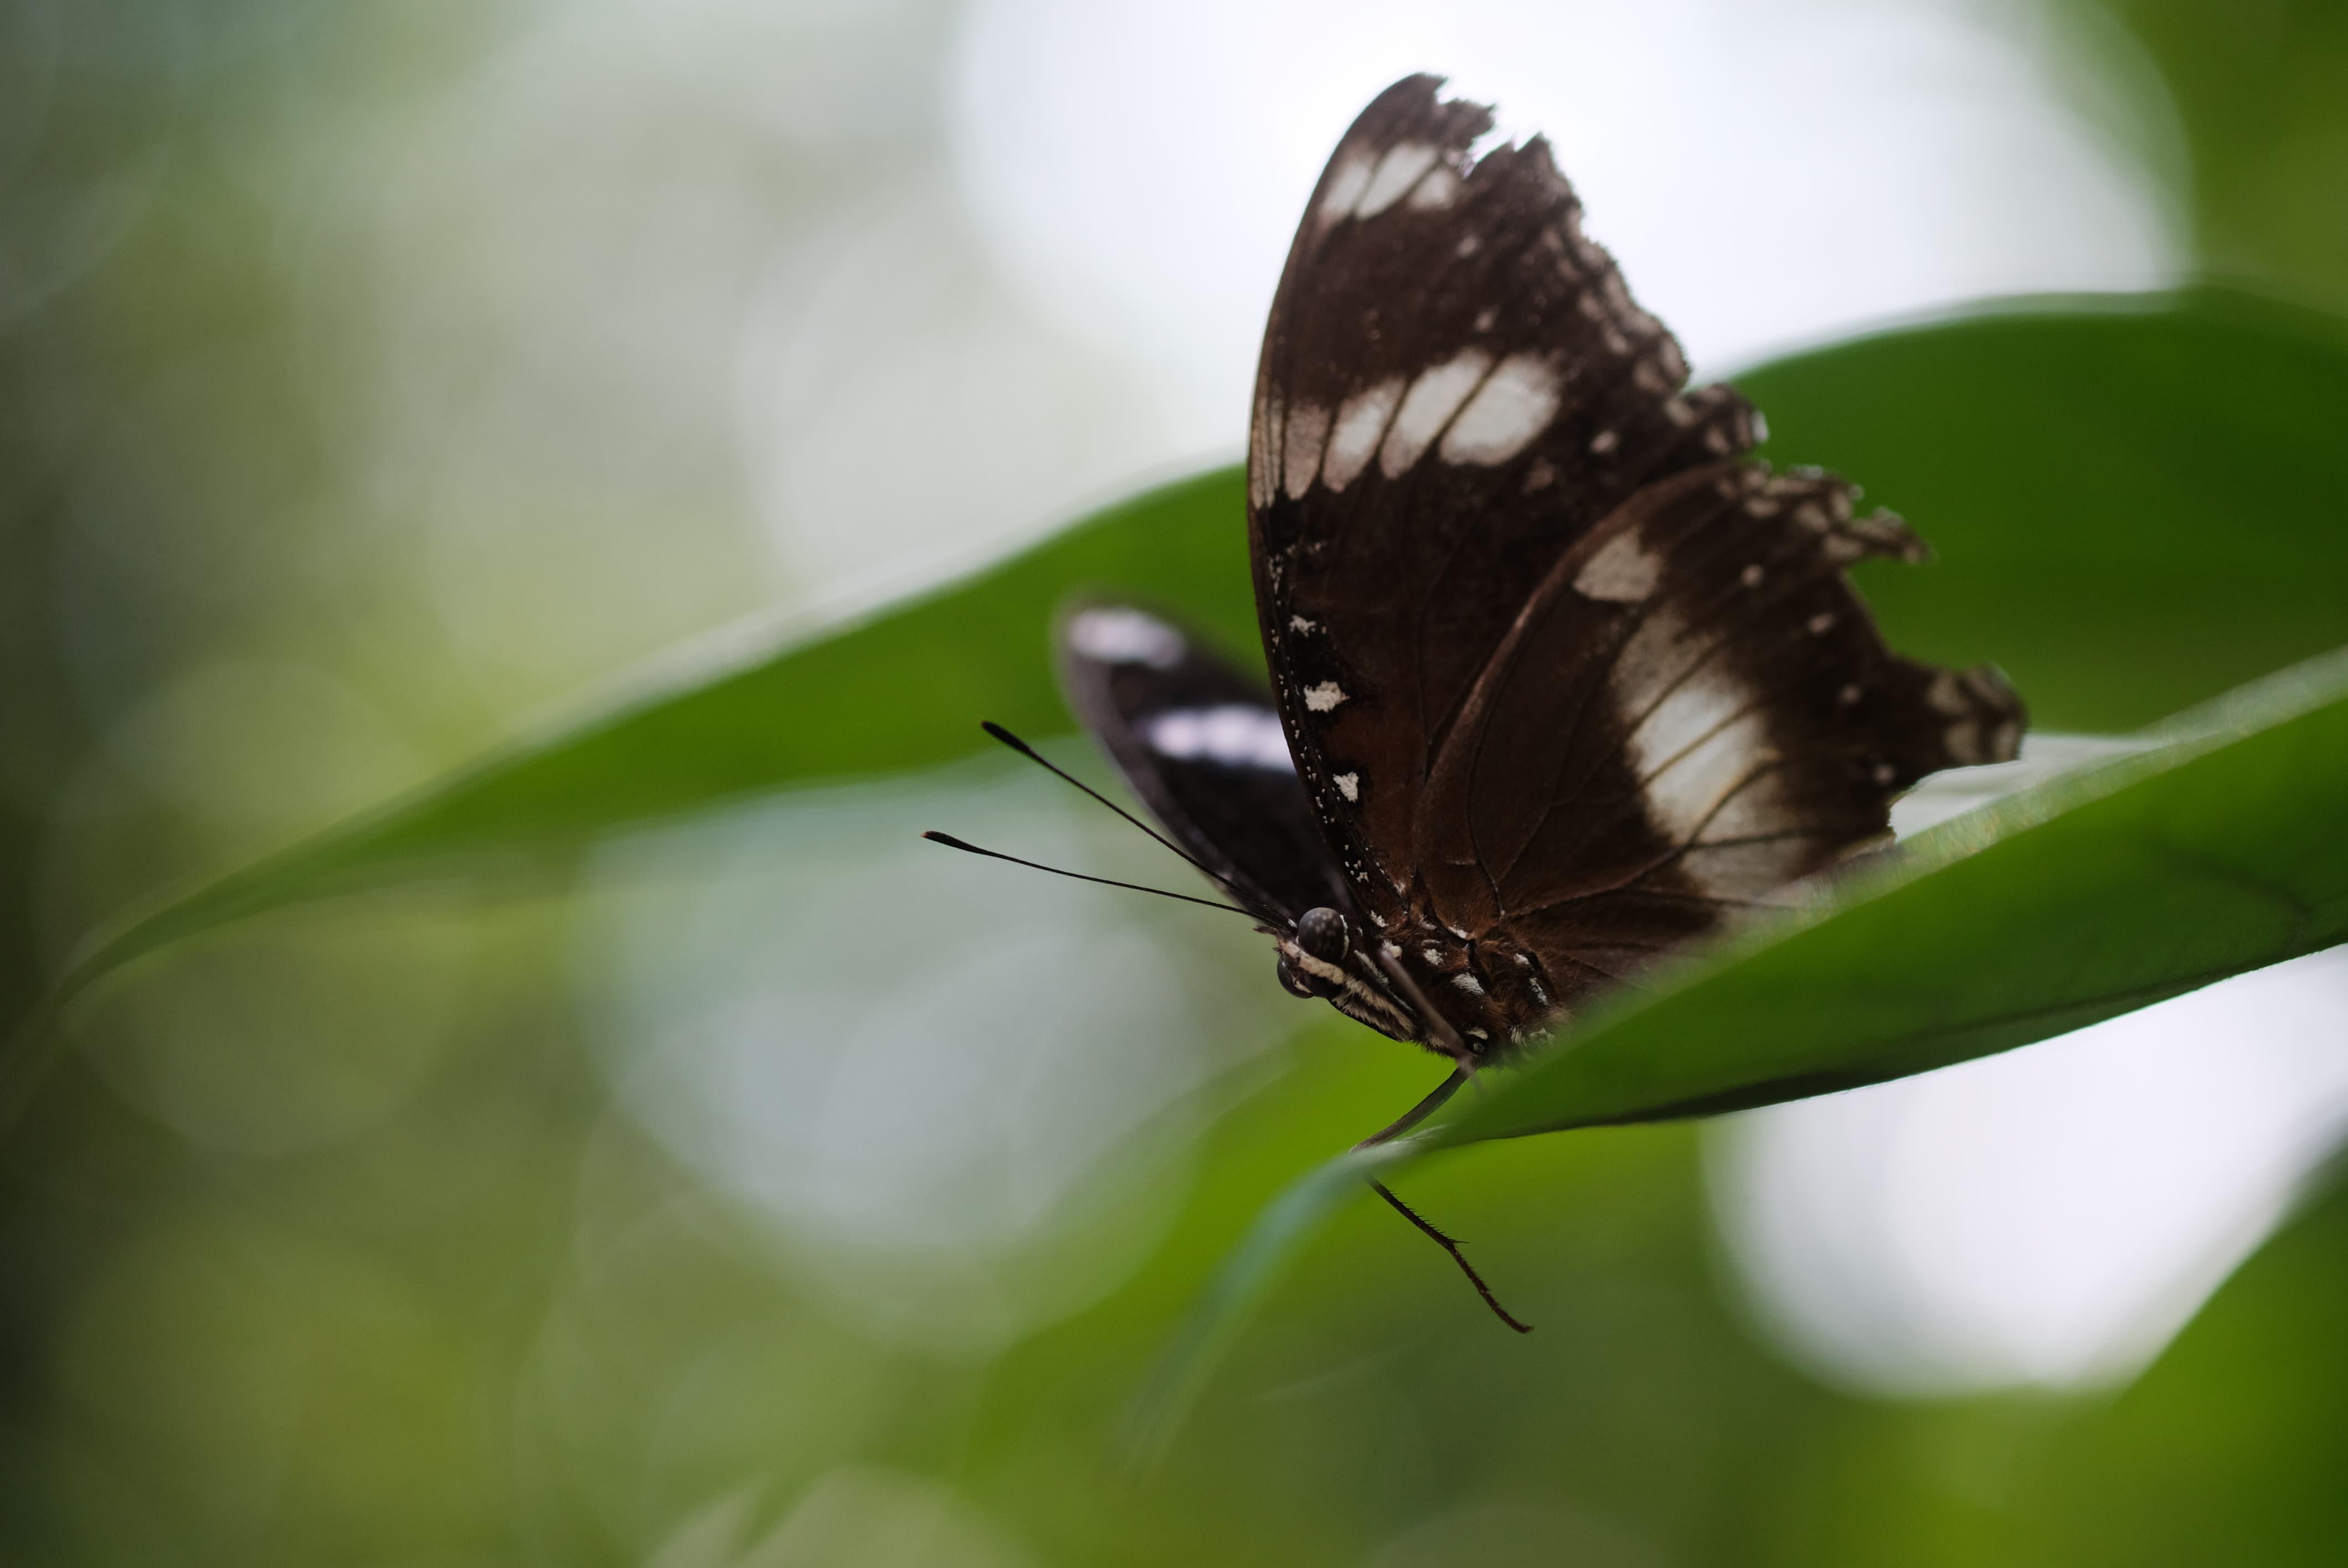 sample butterfly 60mm f/2.4 macro fuji